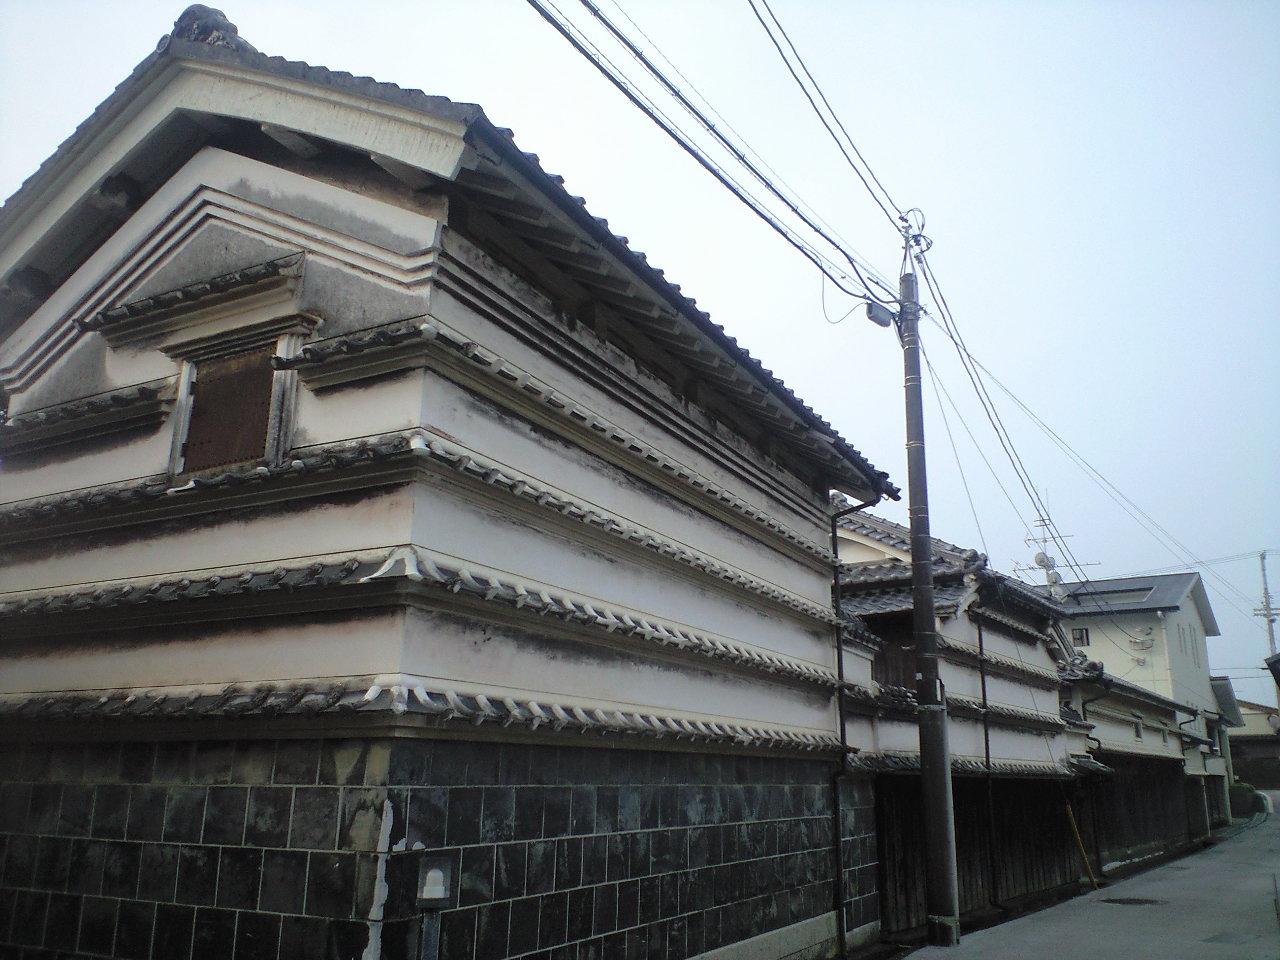 高知県 吉良川 土佐漆喰の街並み保存